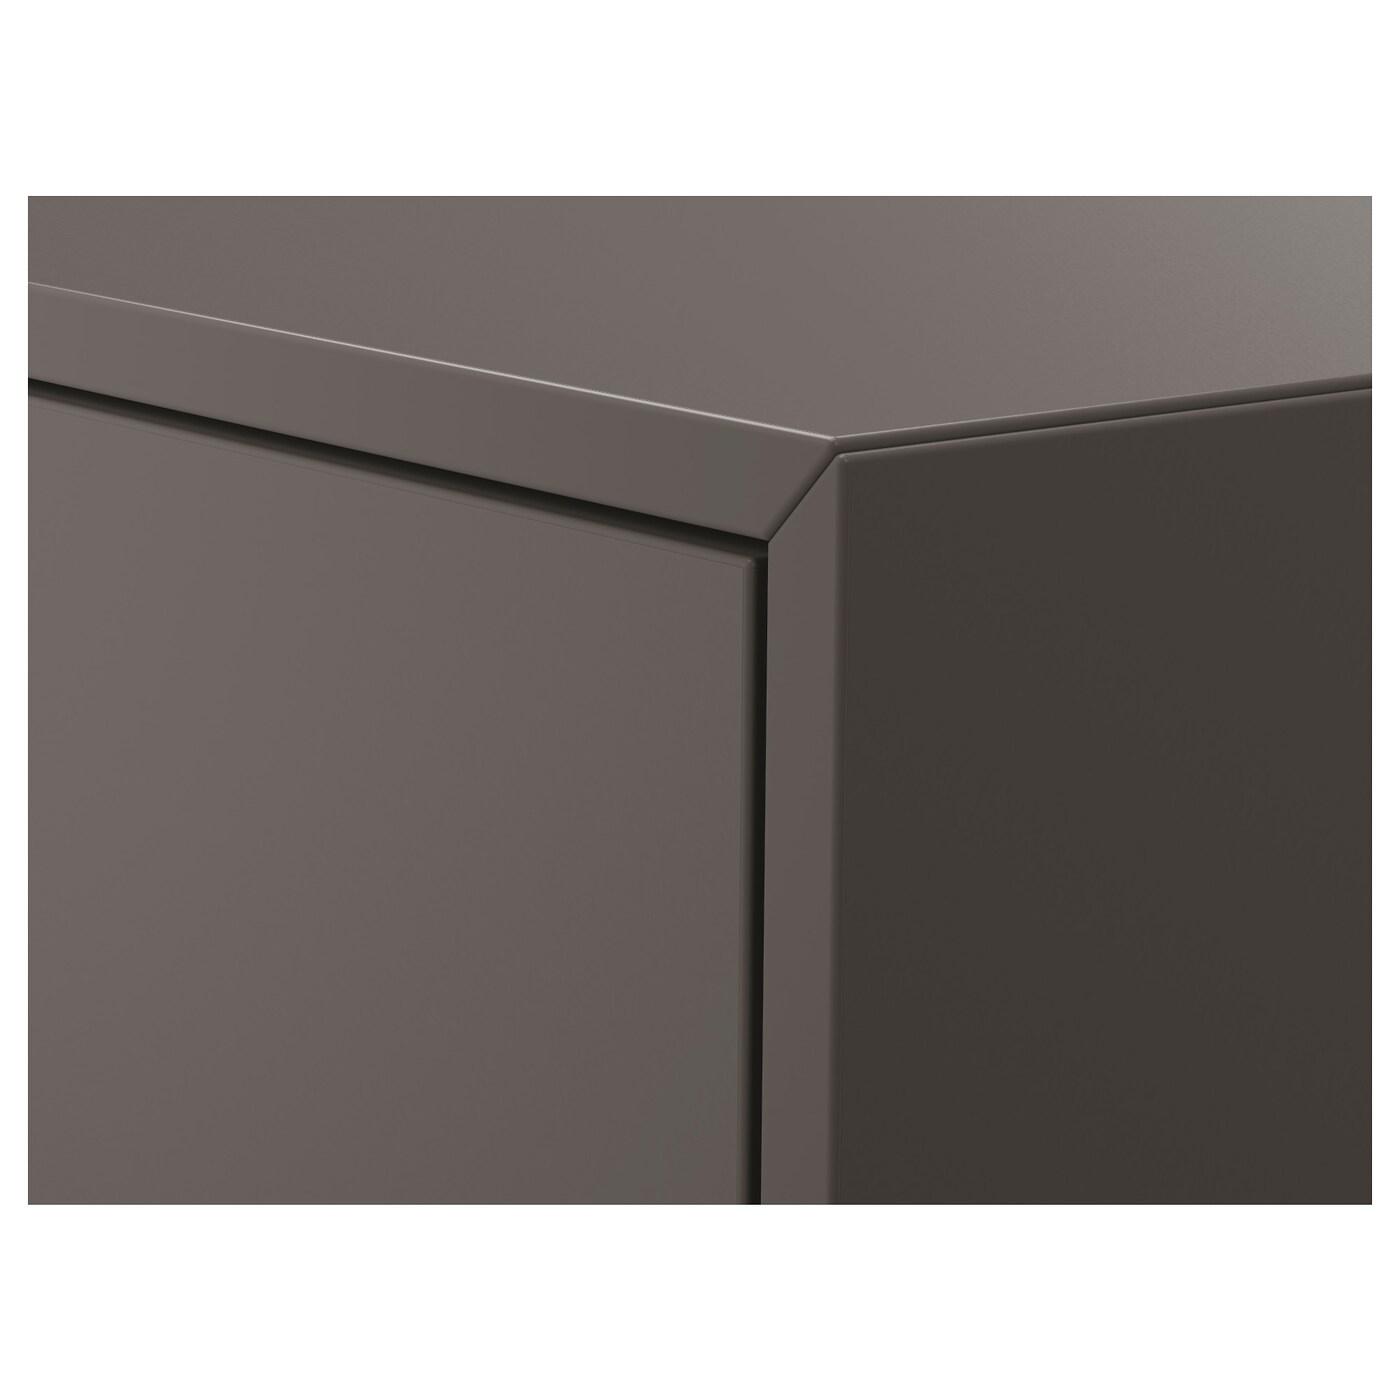 EKET خزانة مع دُرجين, رمادي غامق, 35x35x35 سم